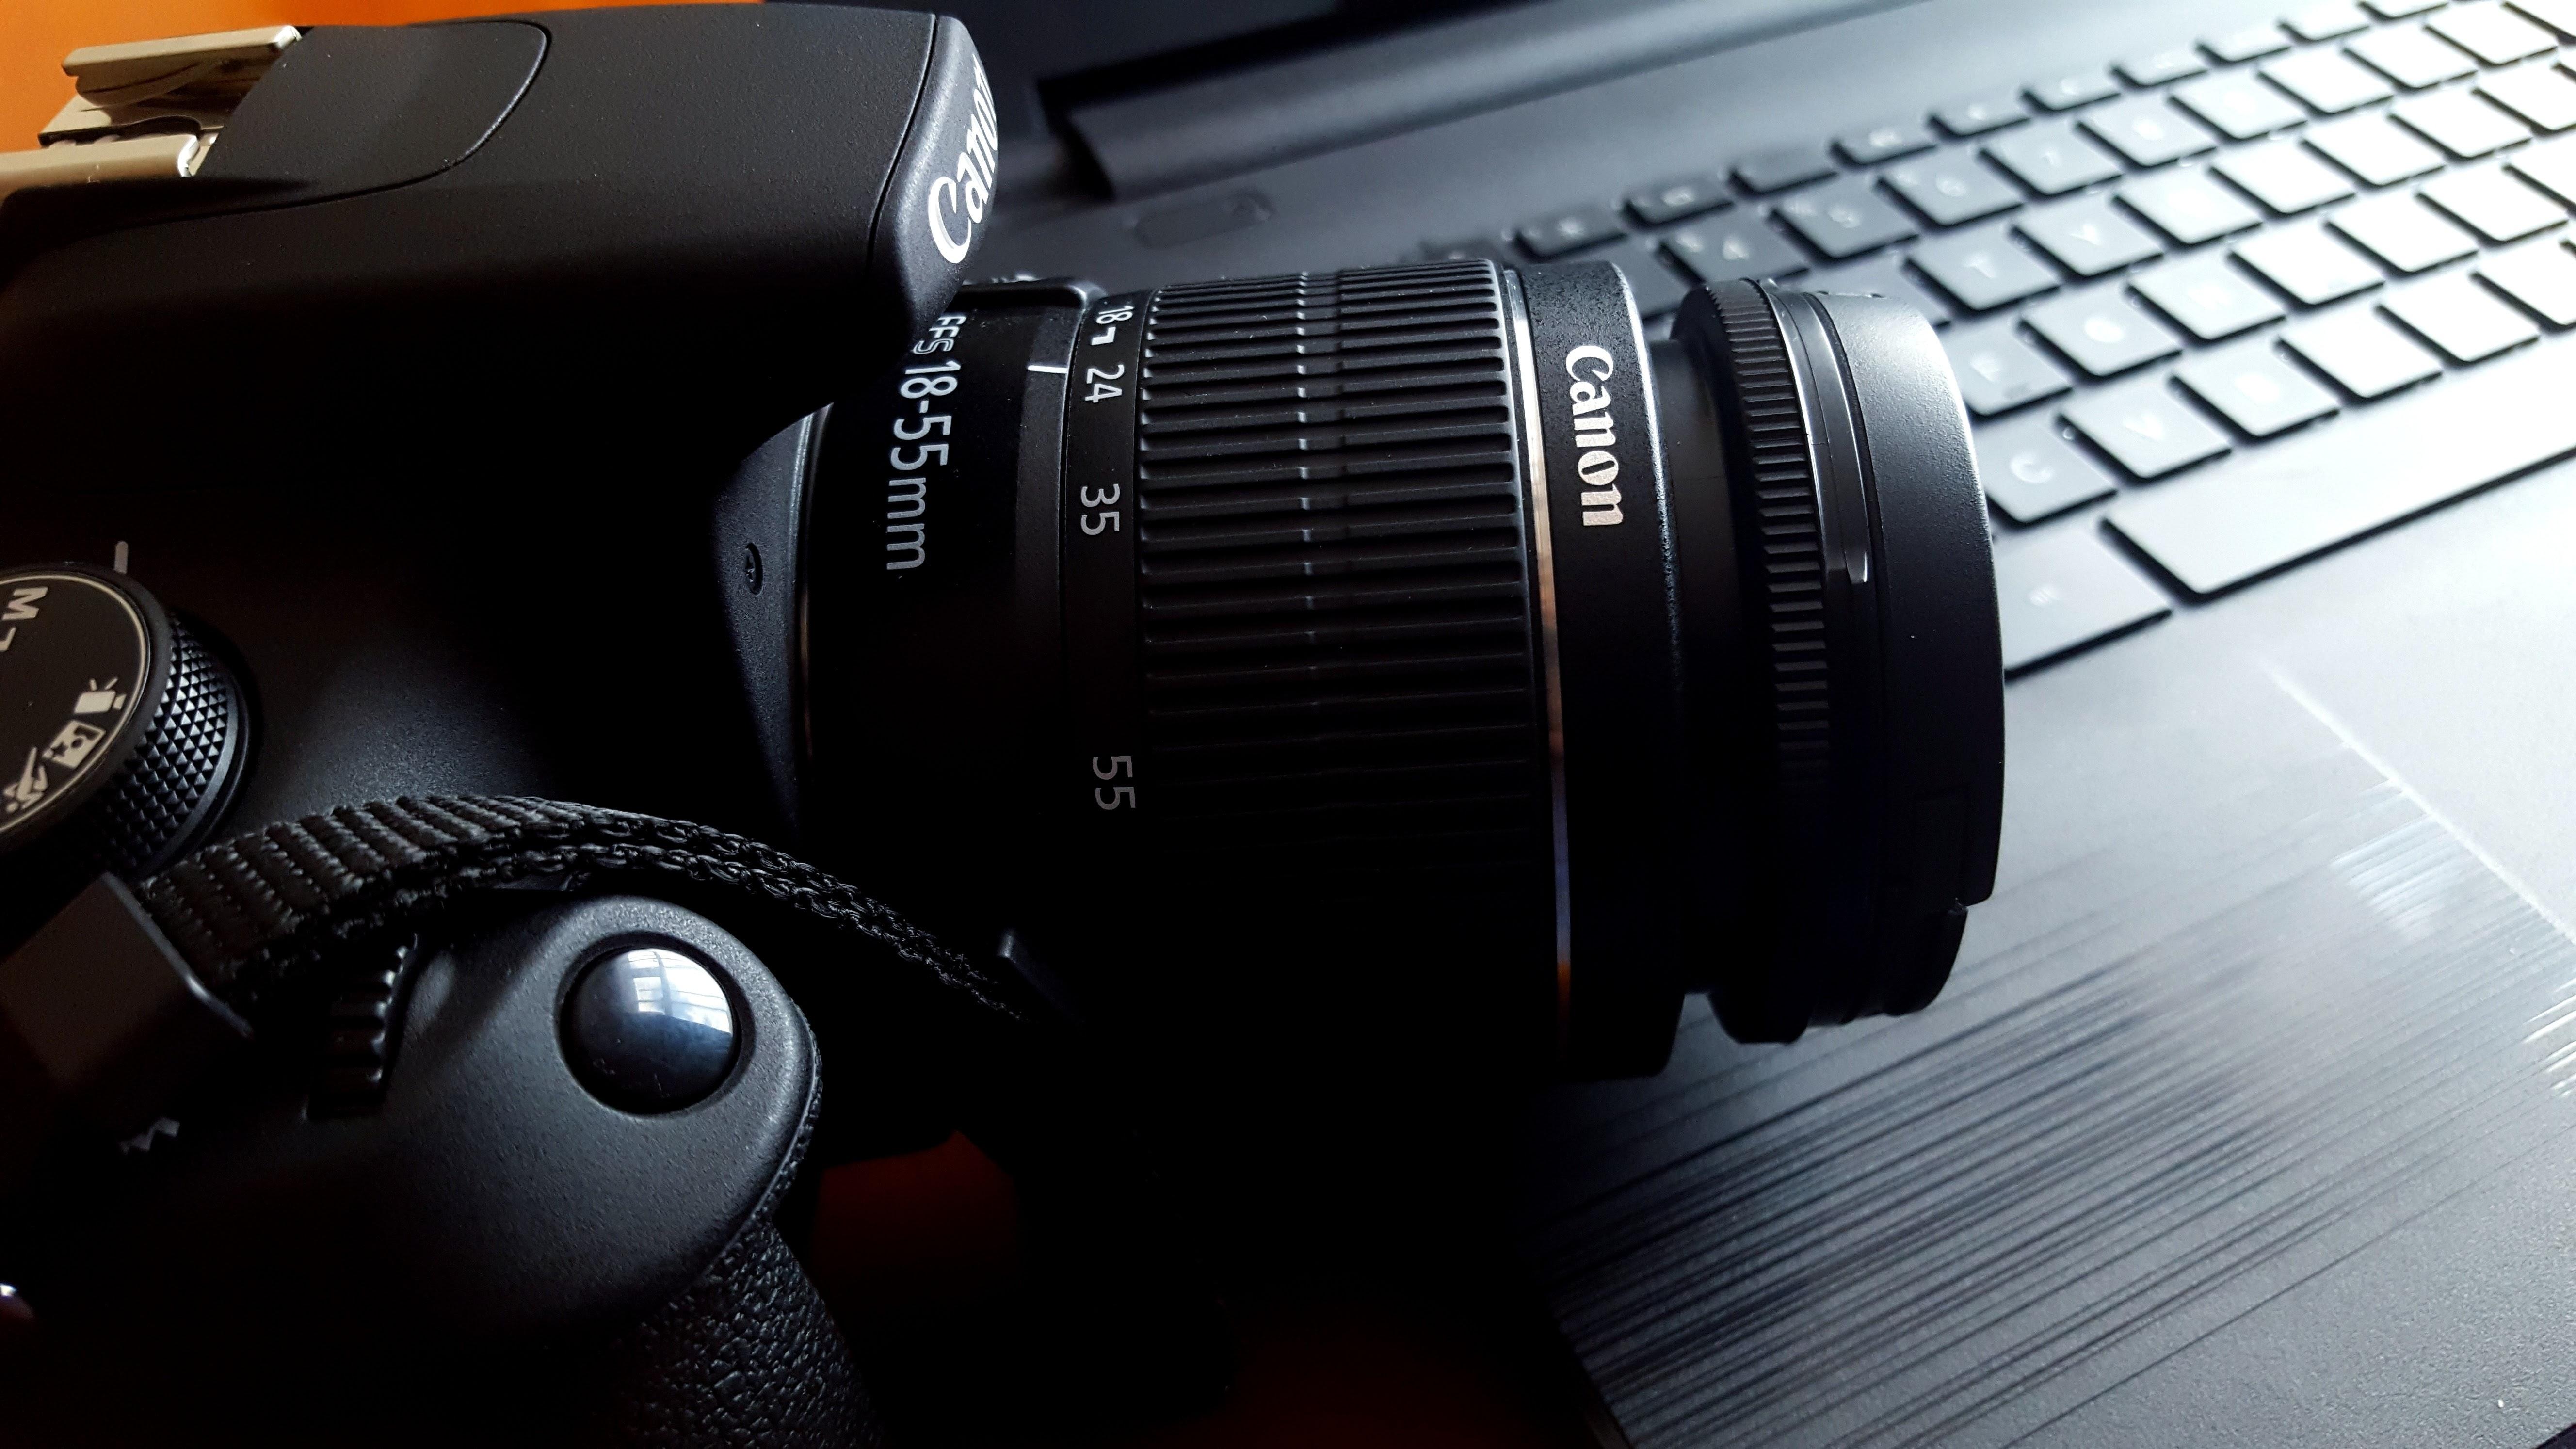 Close-up of canon camera photo